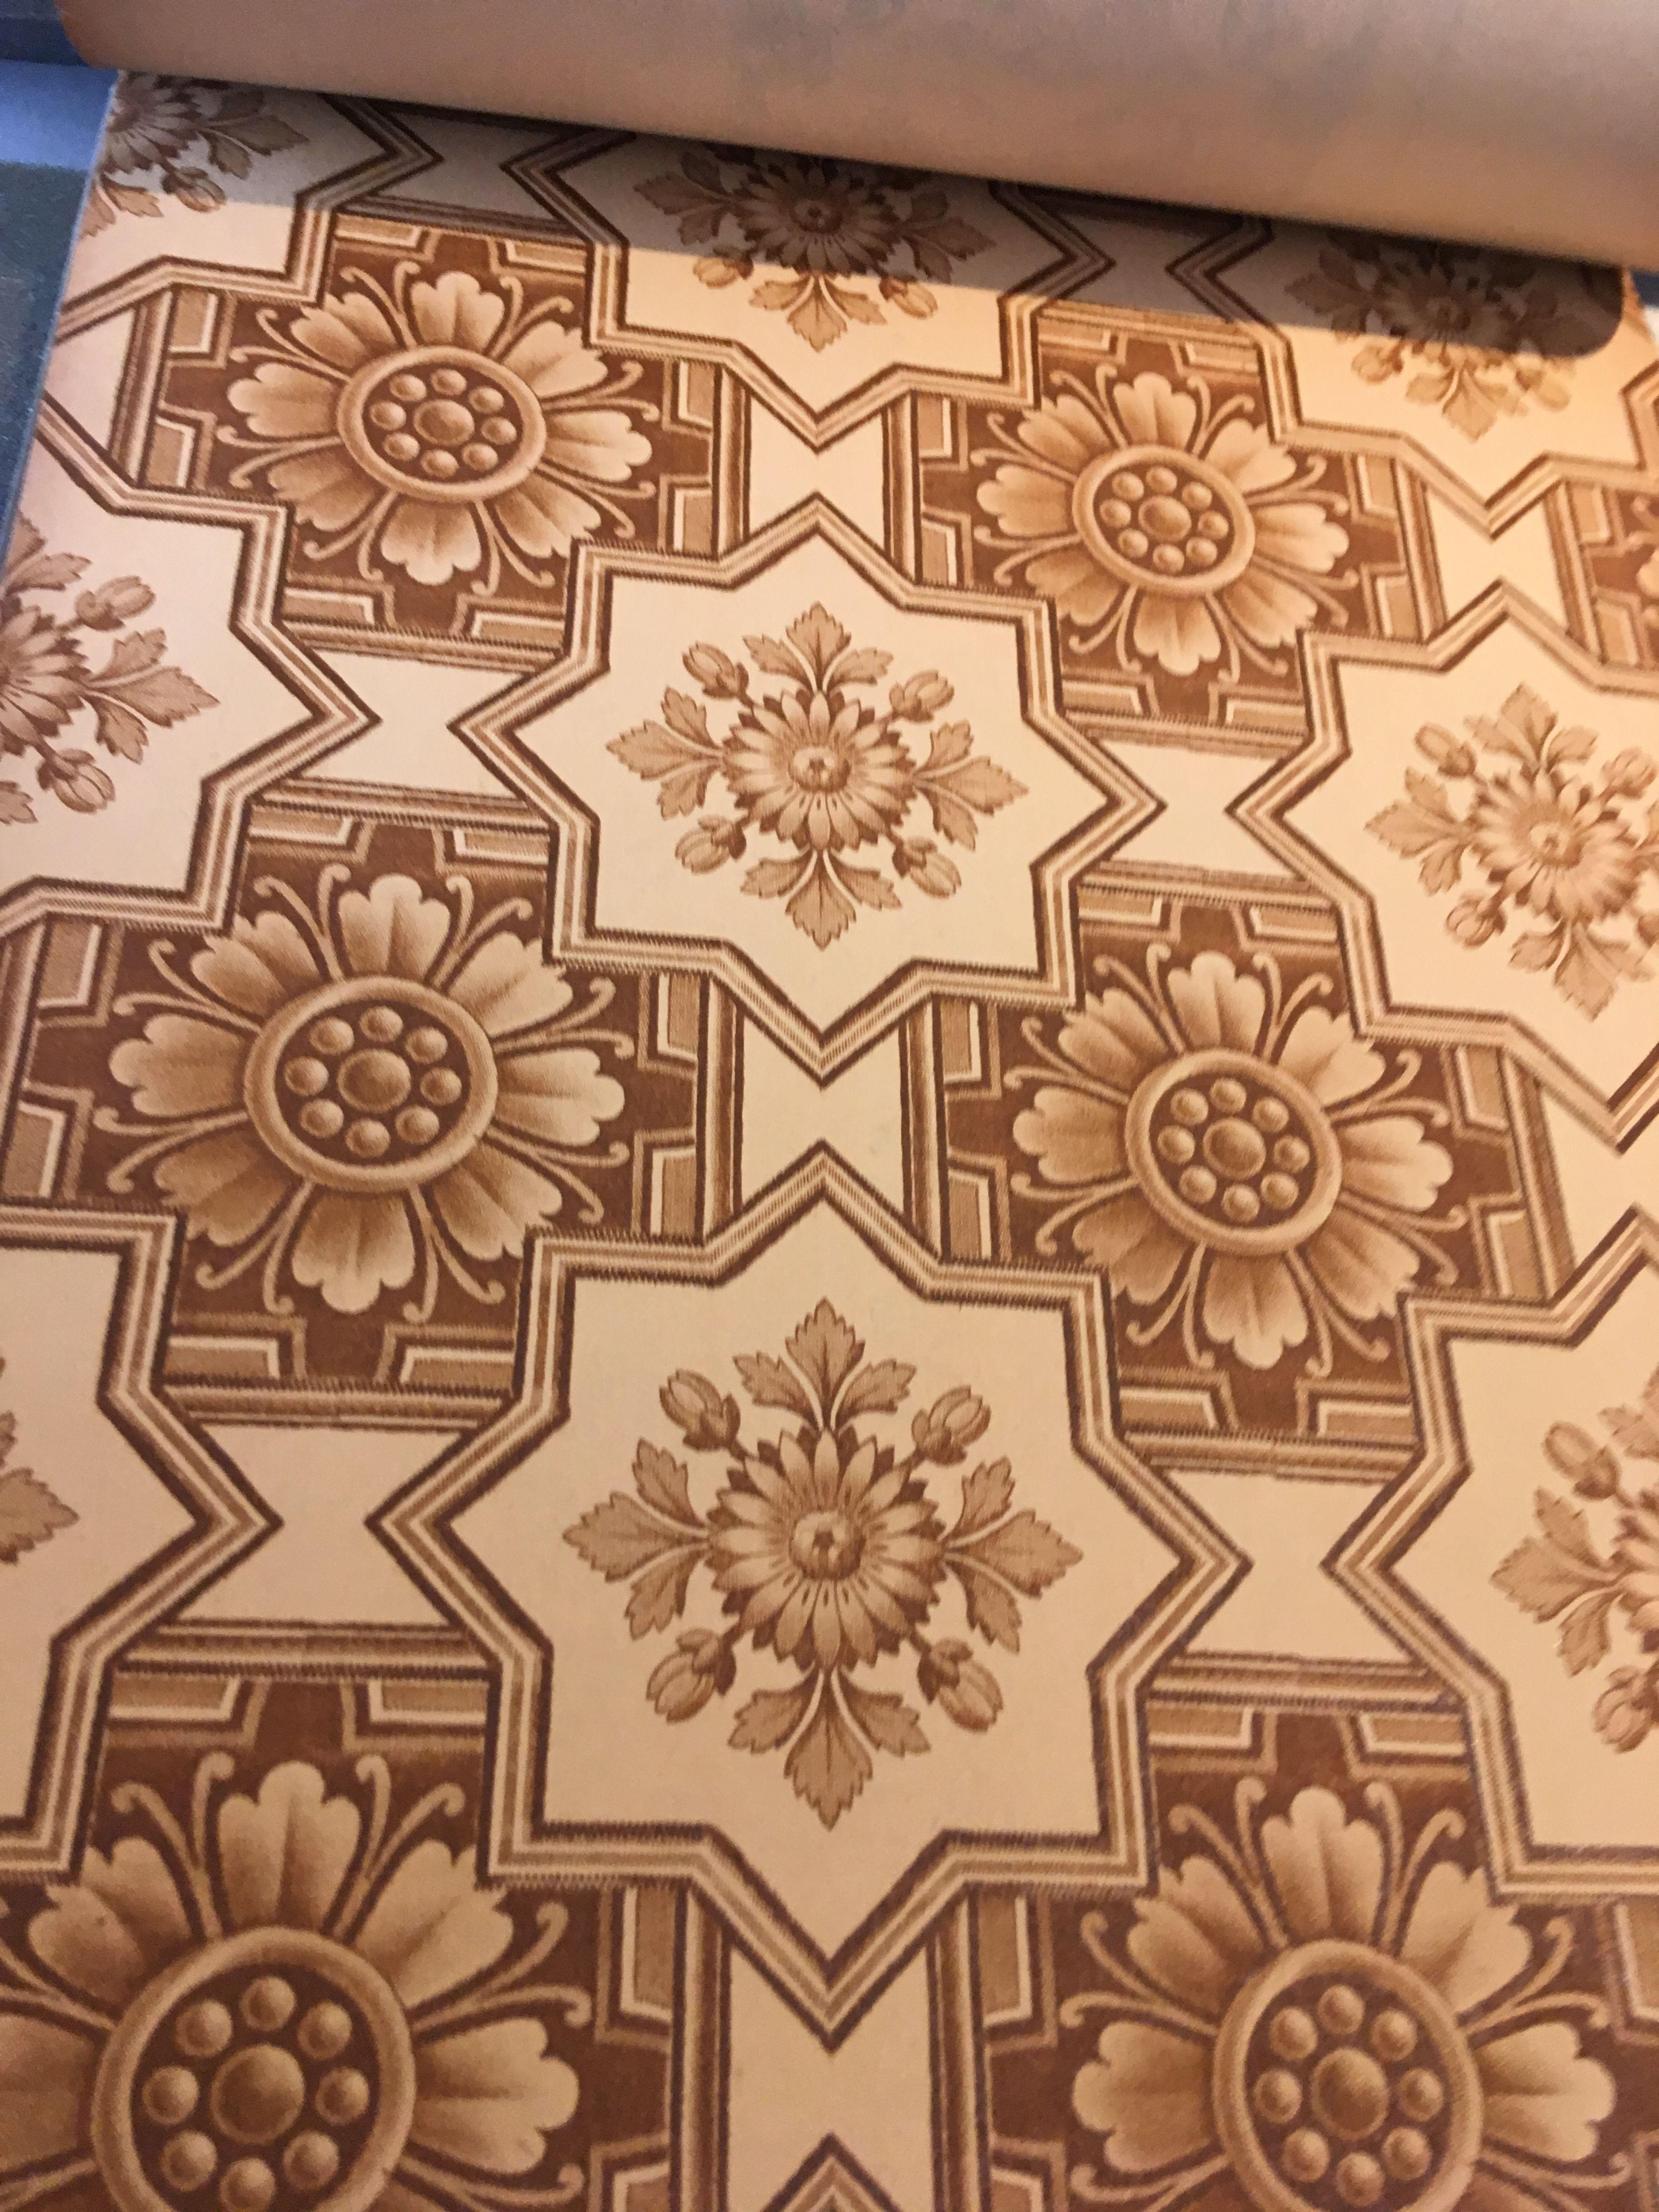 1914 antique Edwardian sanitary wallpaper with tile design